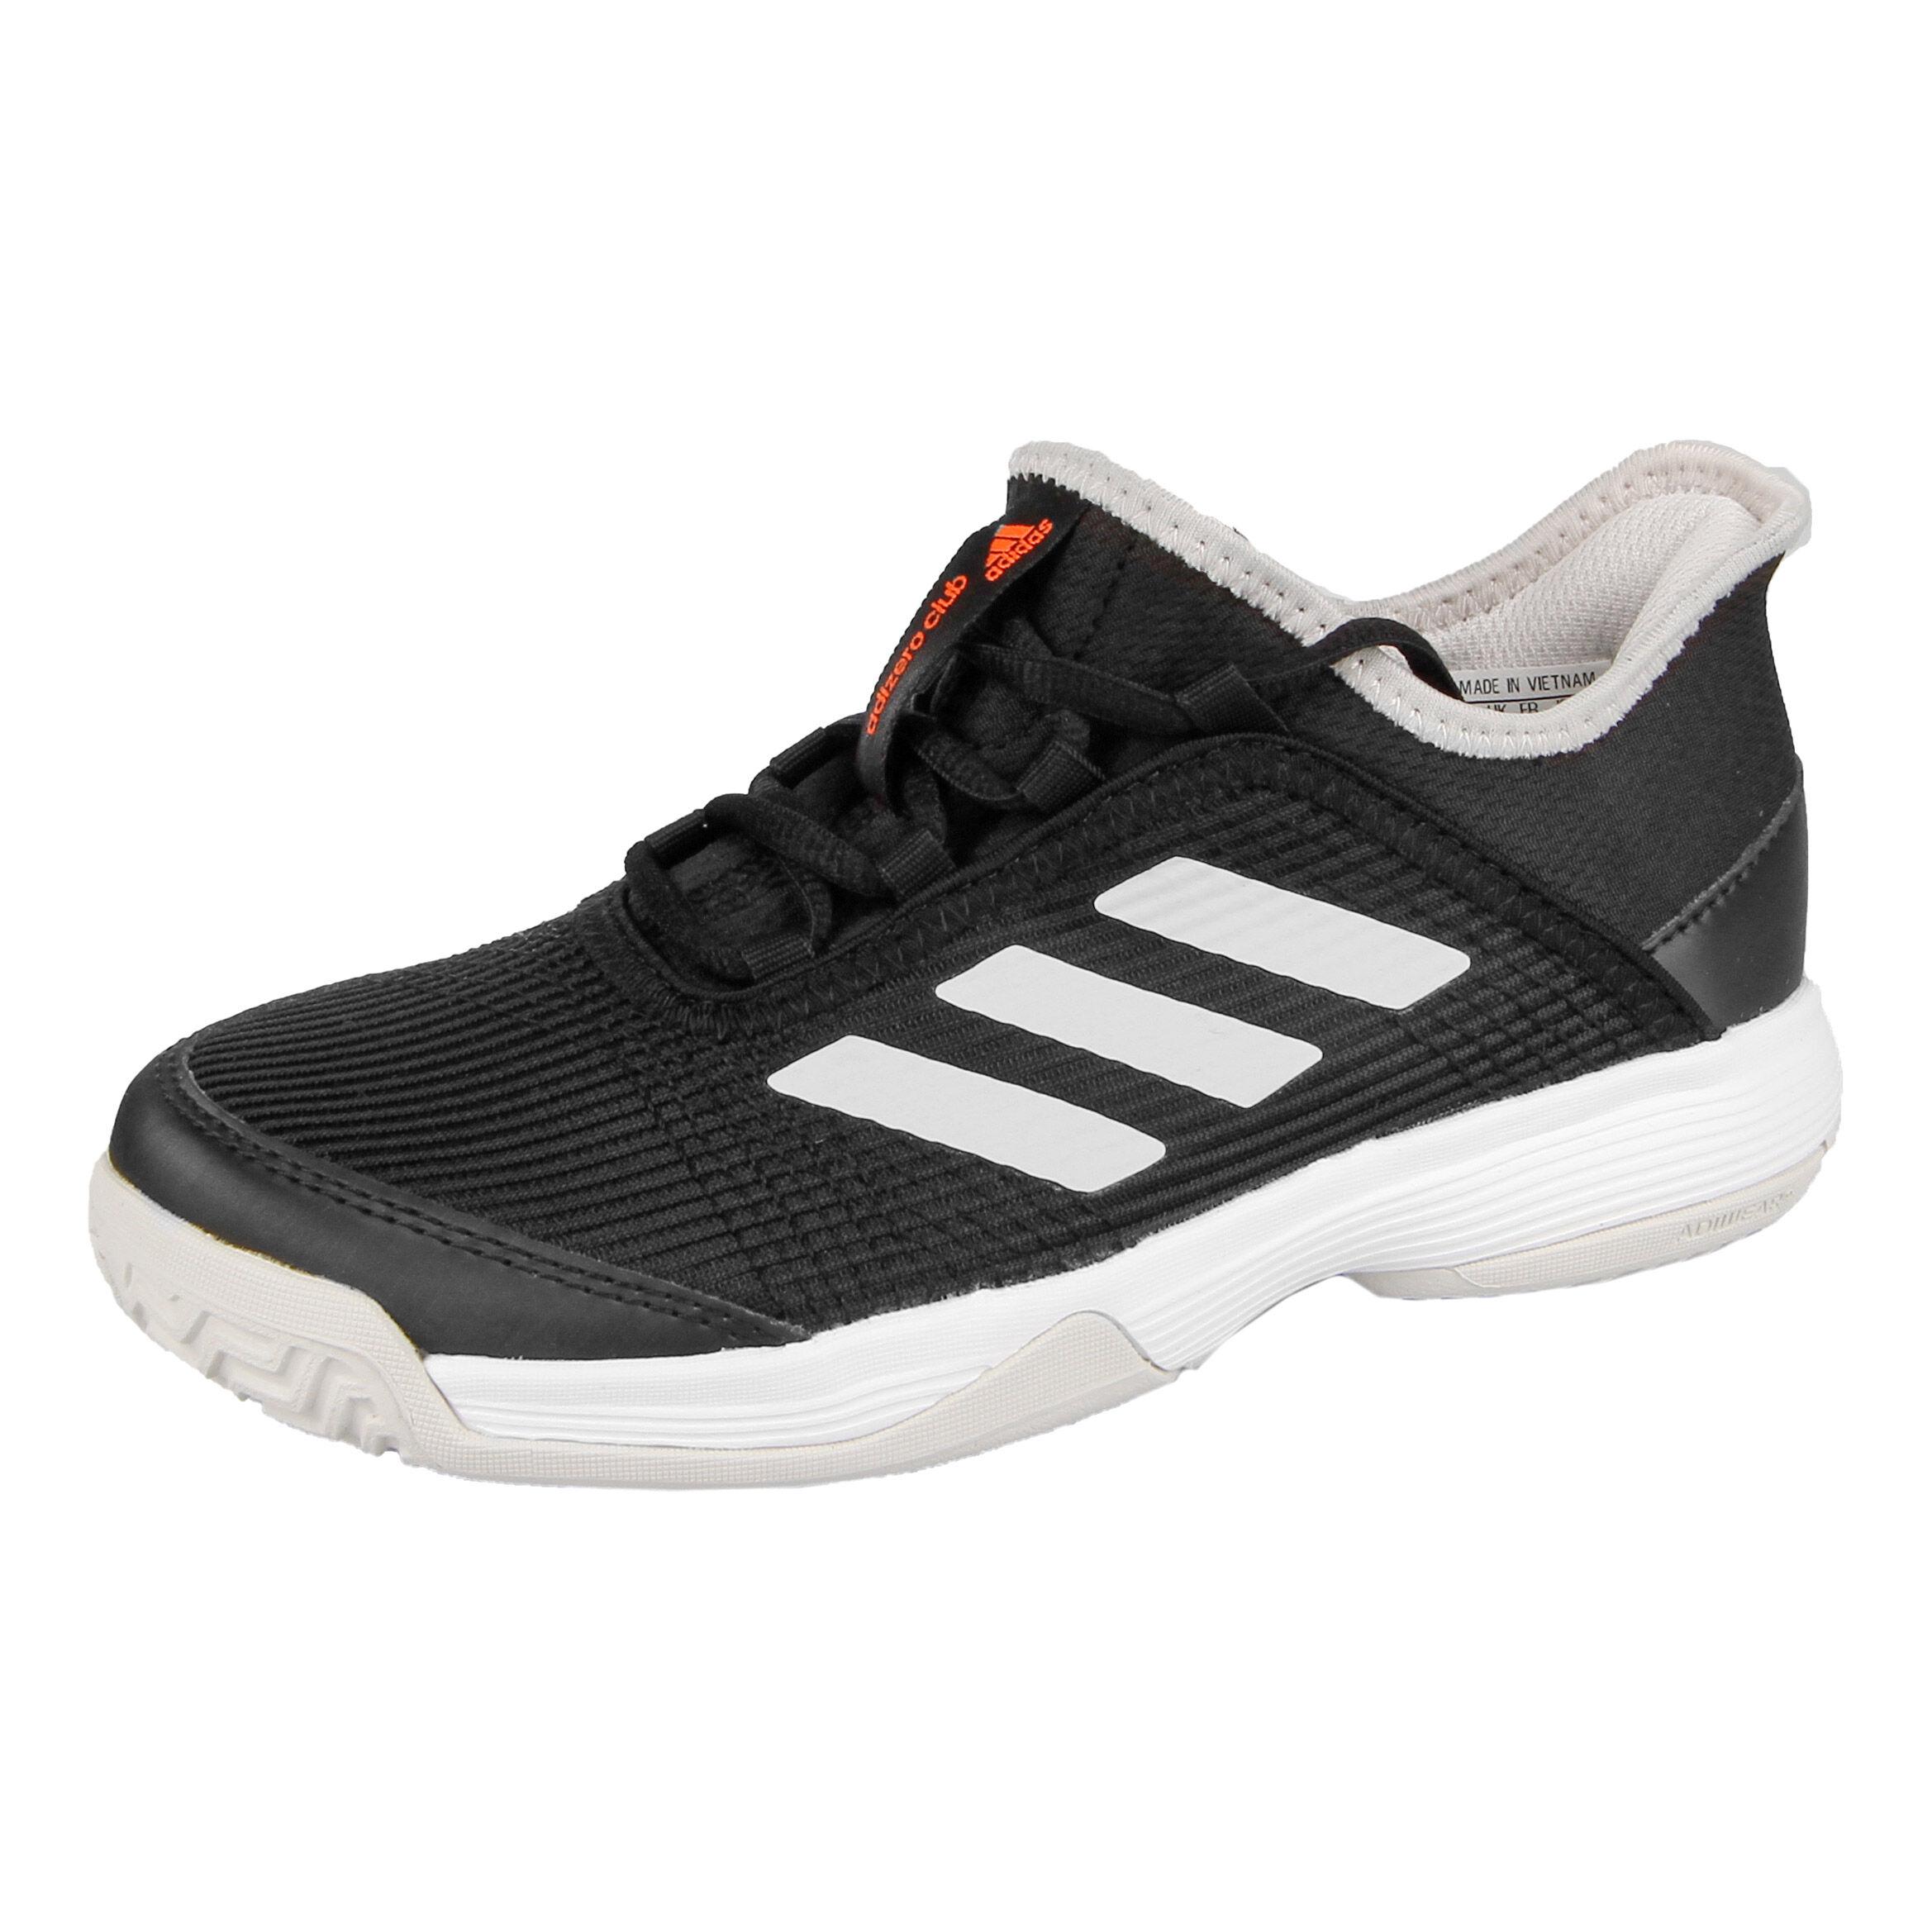 Køb Adidas Barricade Club JR Tennissko, Black Jollyroom Jollyroom